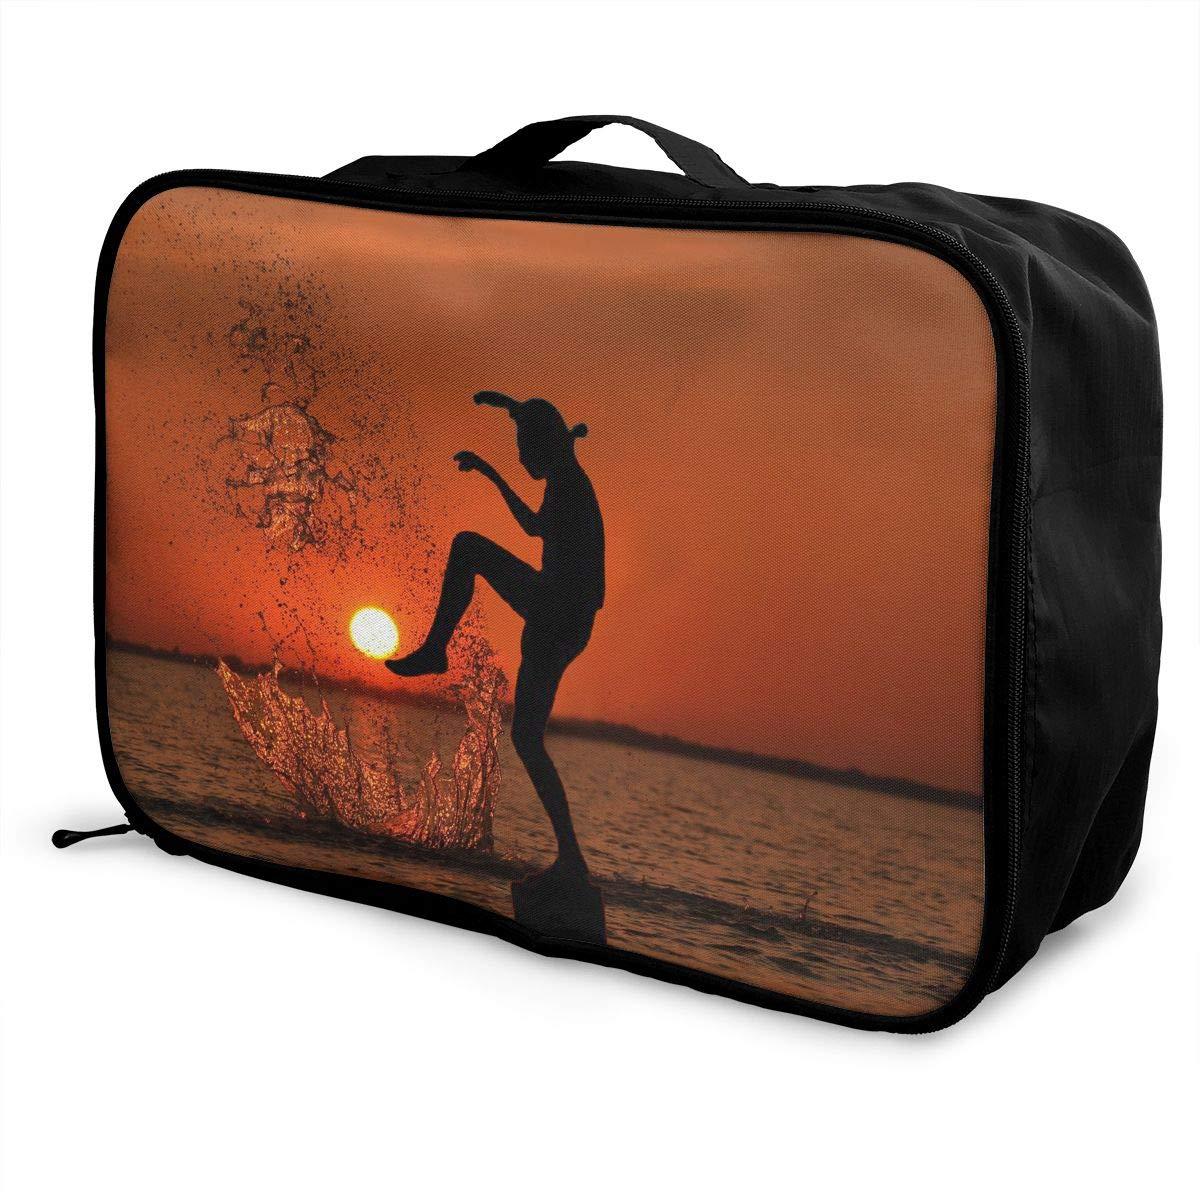 Travel Luggage Duffle Bag Lightweight Portable Handbag Large Capacity Waterproof Foldable Storage Tote